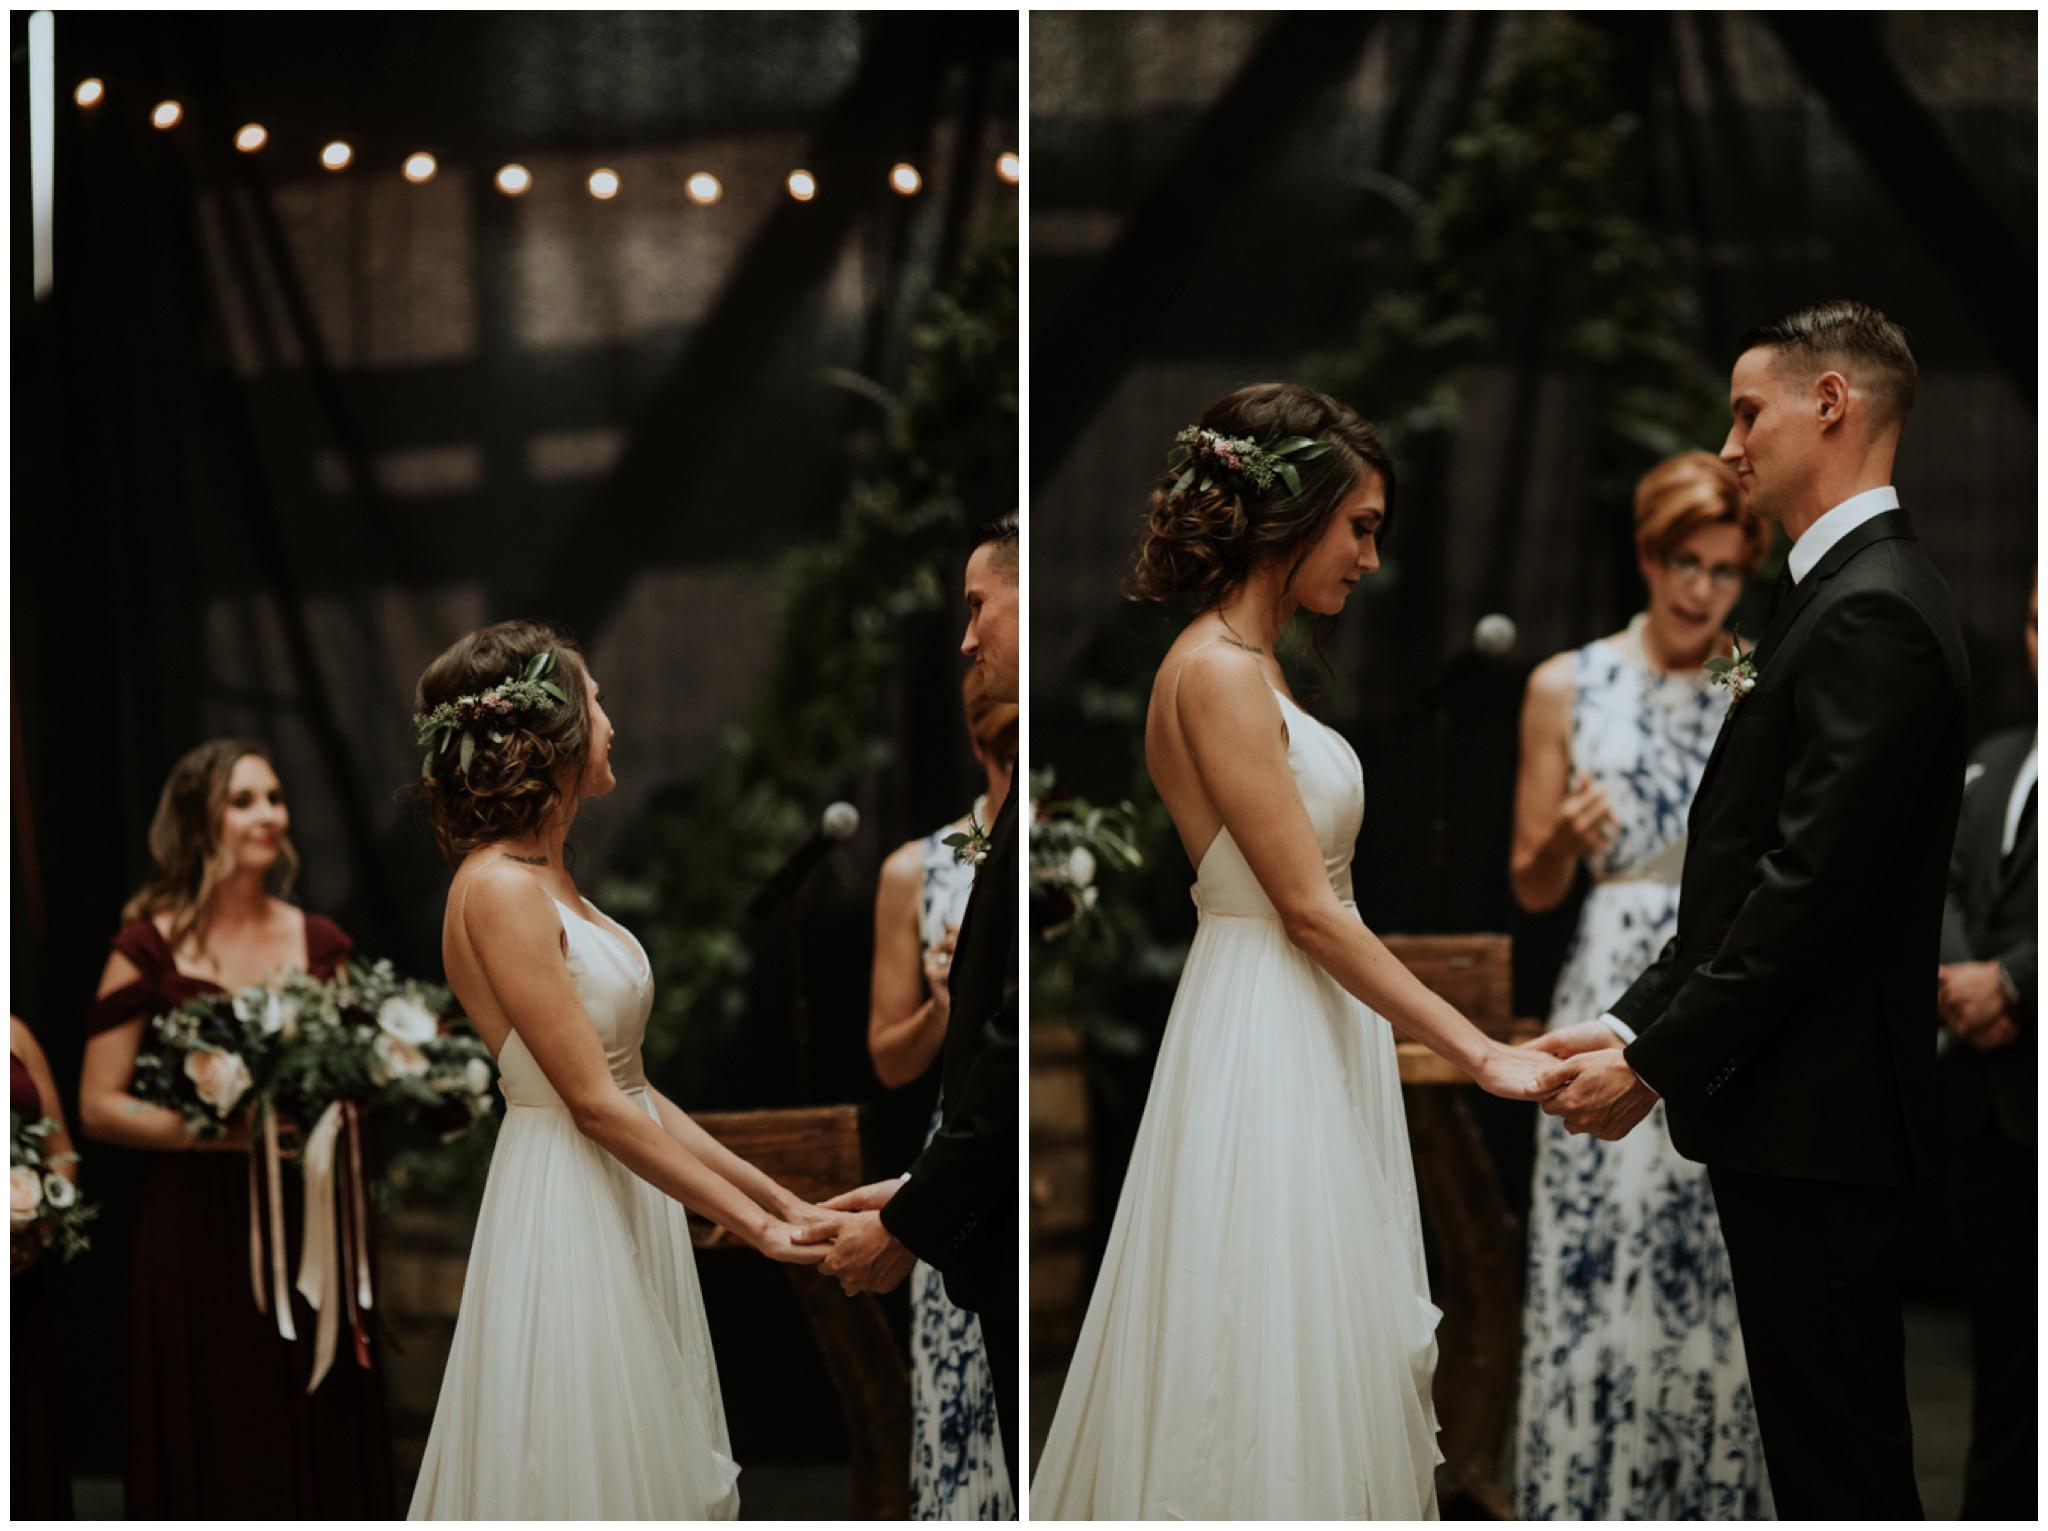 alyssa-keiran-westland-distillery-urban-seattle-wedding-photographer-caitlyn-nikula-116.jpg